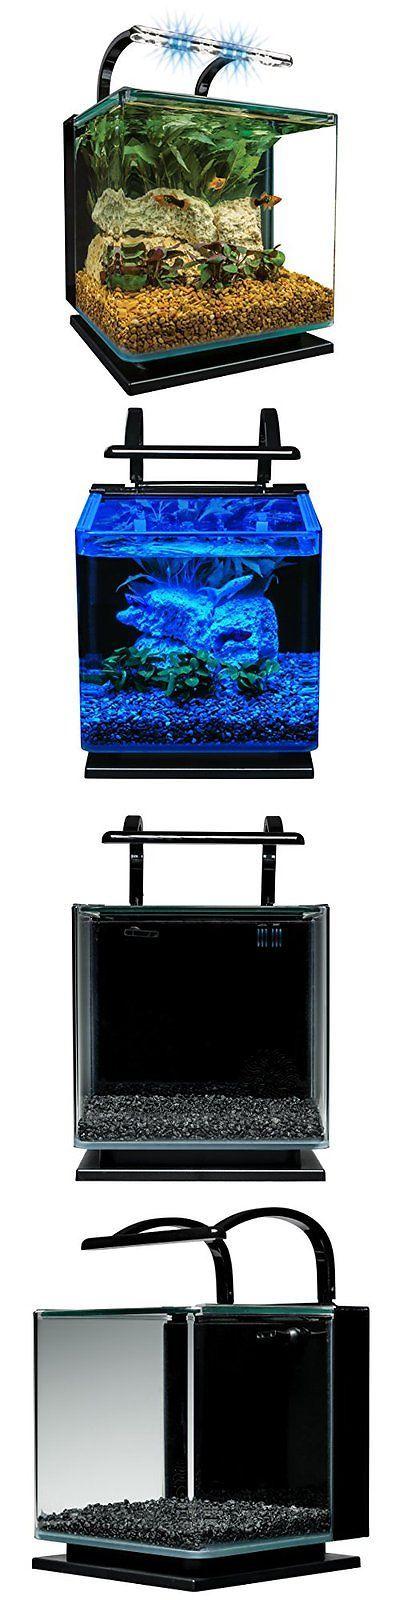 Aquariums and Tanks 20755: Marineland Contour Glass Aquarium Kit With Rail Light, 3-Gallon BUY IT NOW ONLY: $68.4